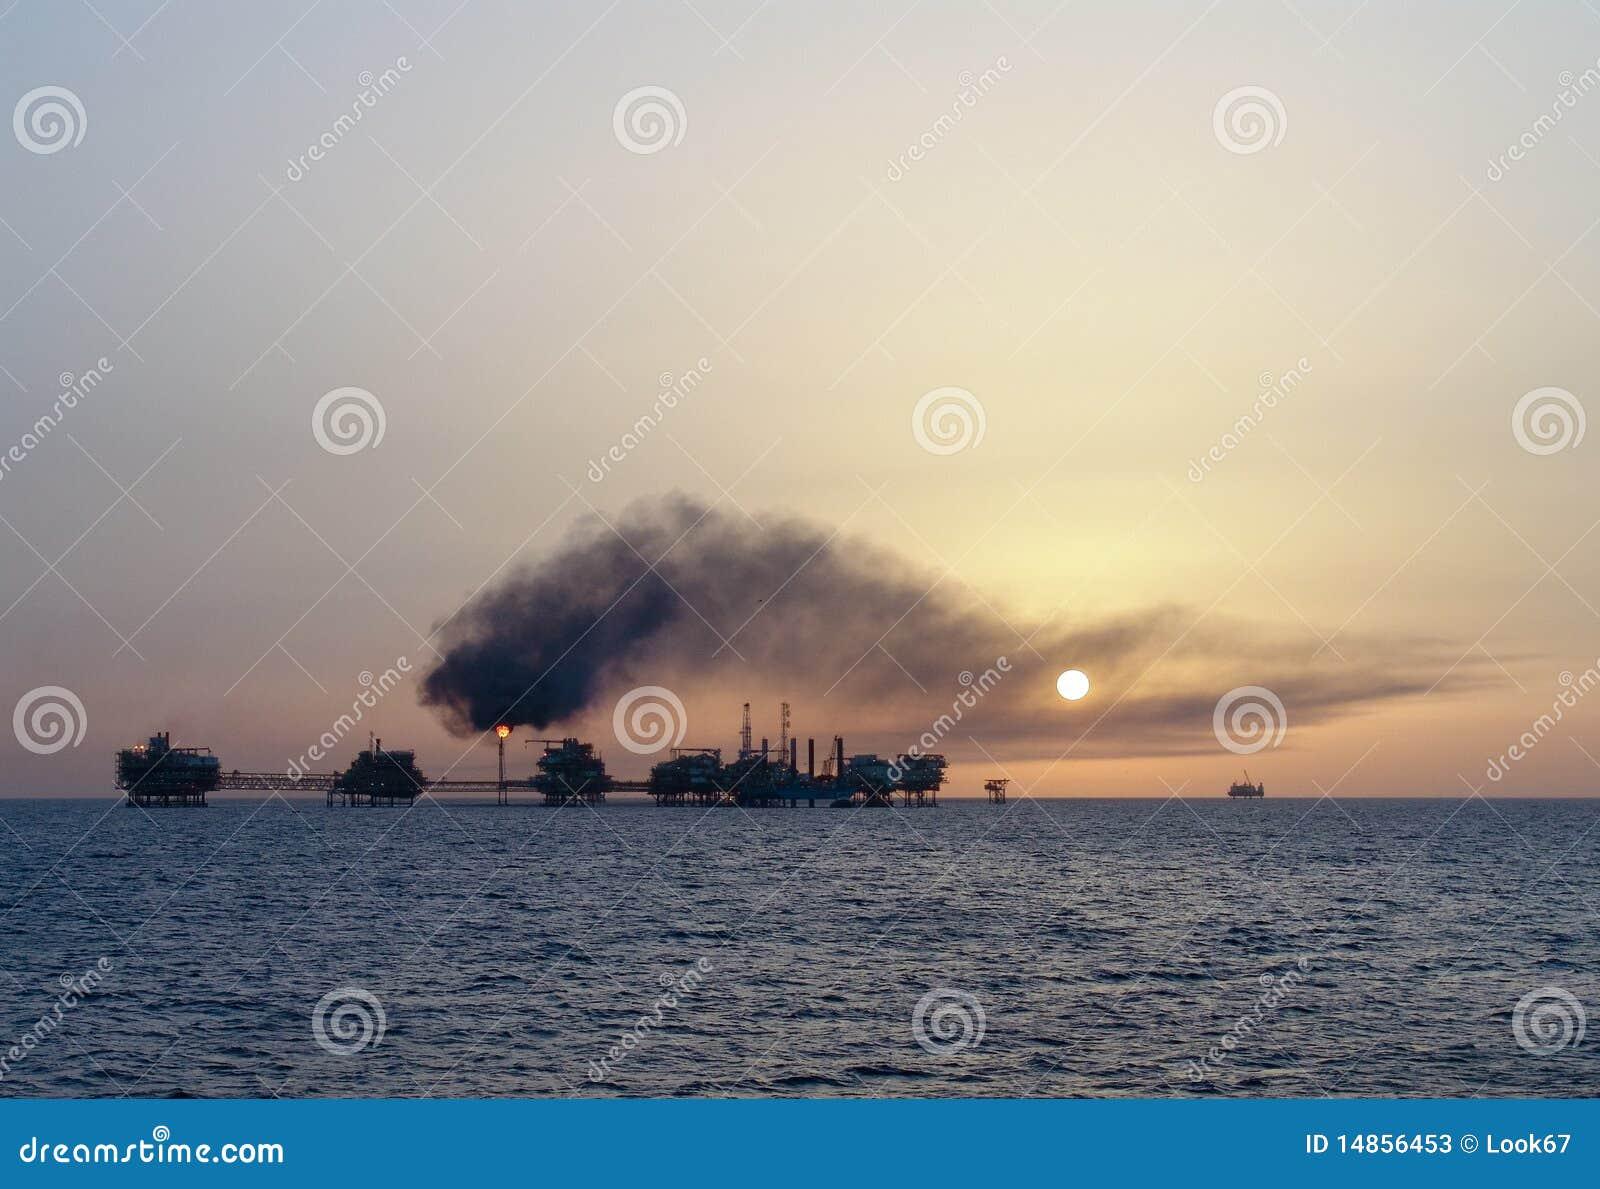 Abo Al Bukhoosh oil complex